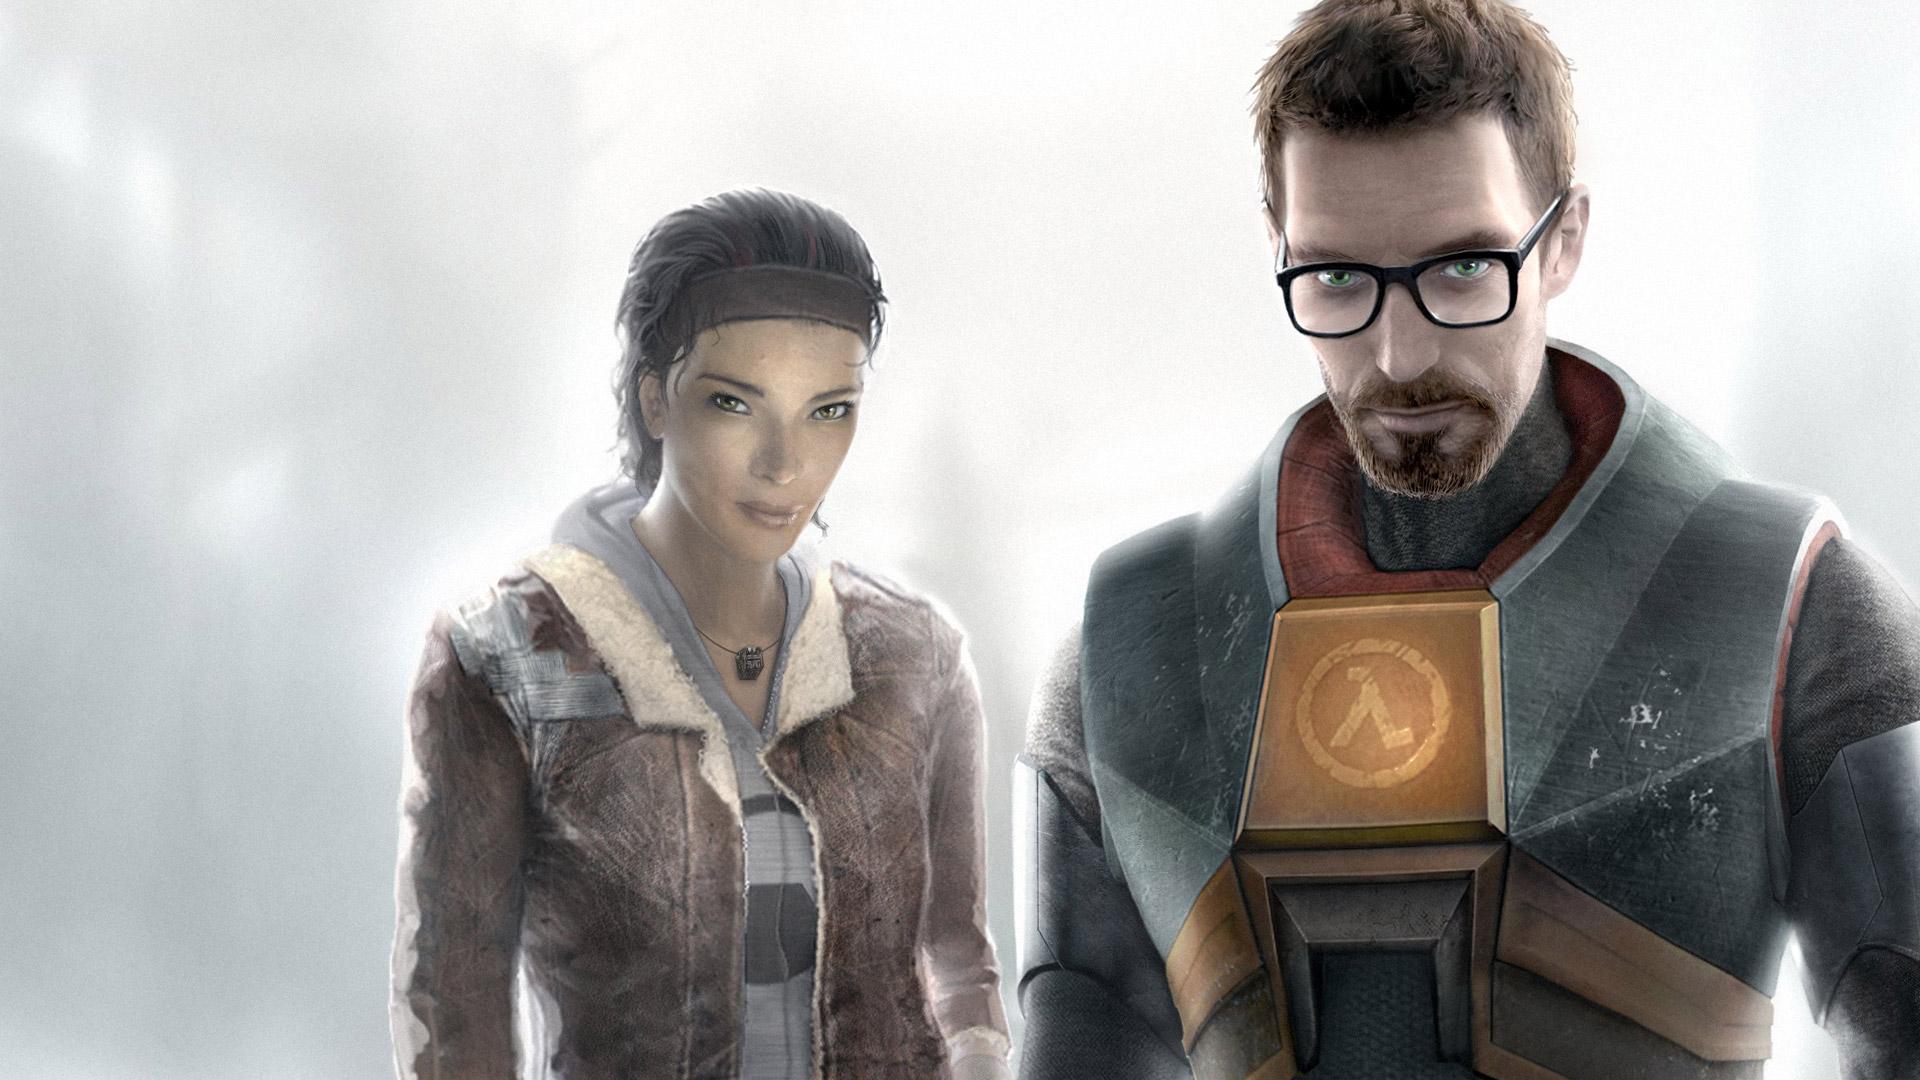 Half-Life 2 Wallpaper in 1920x1080